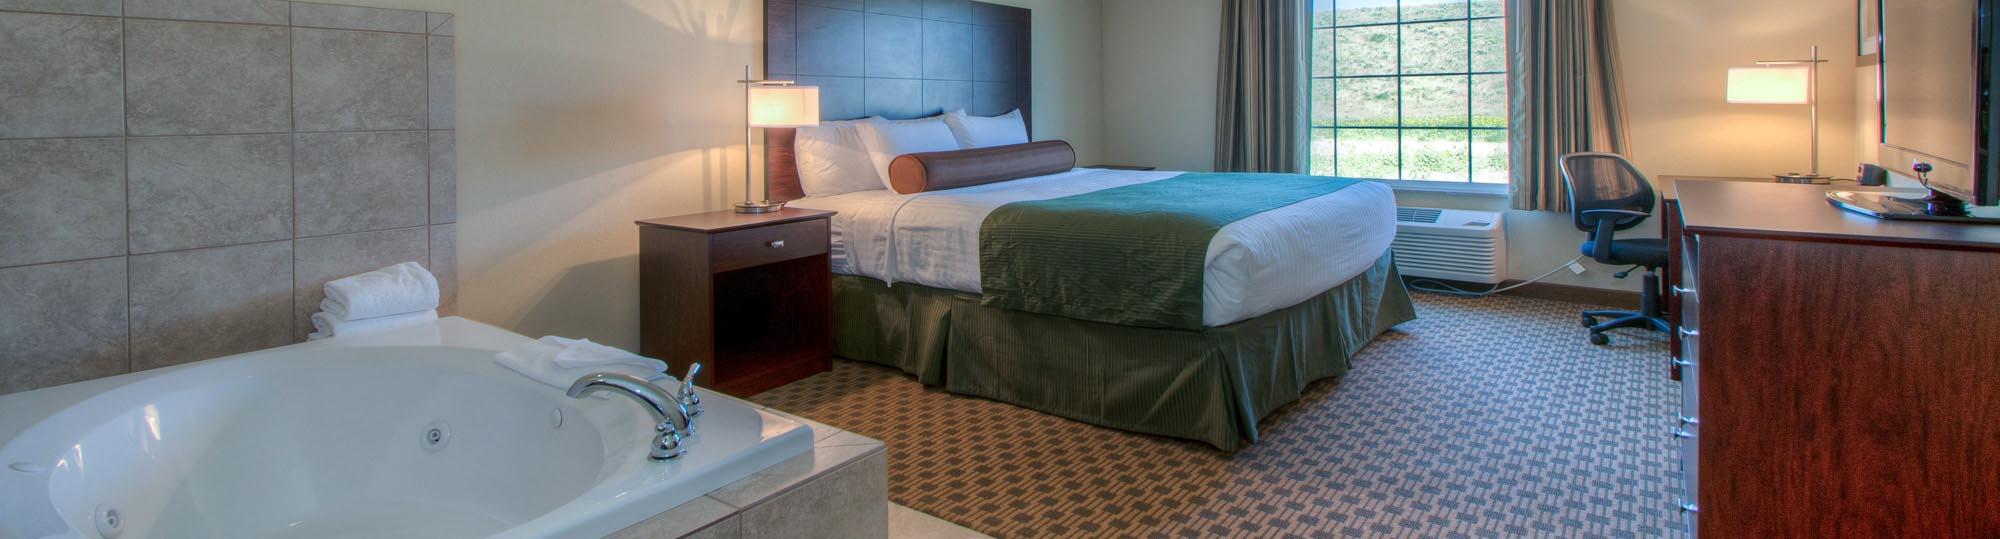 Cobblestone Inn & Suites Wray